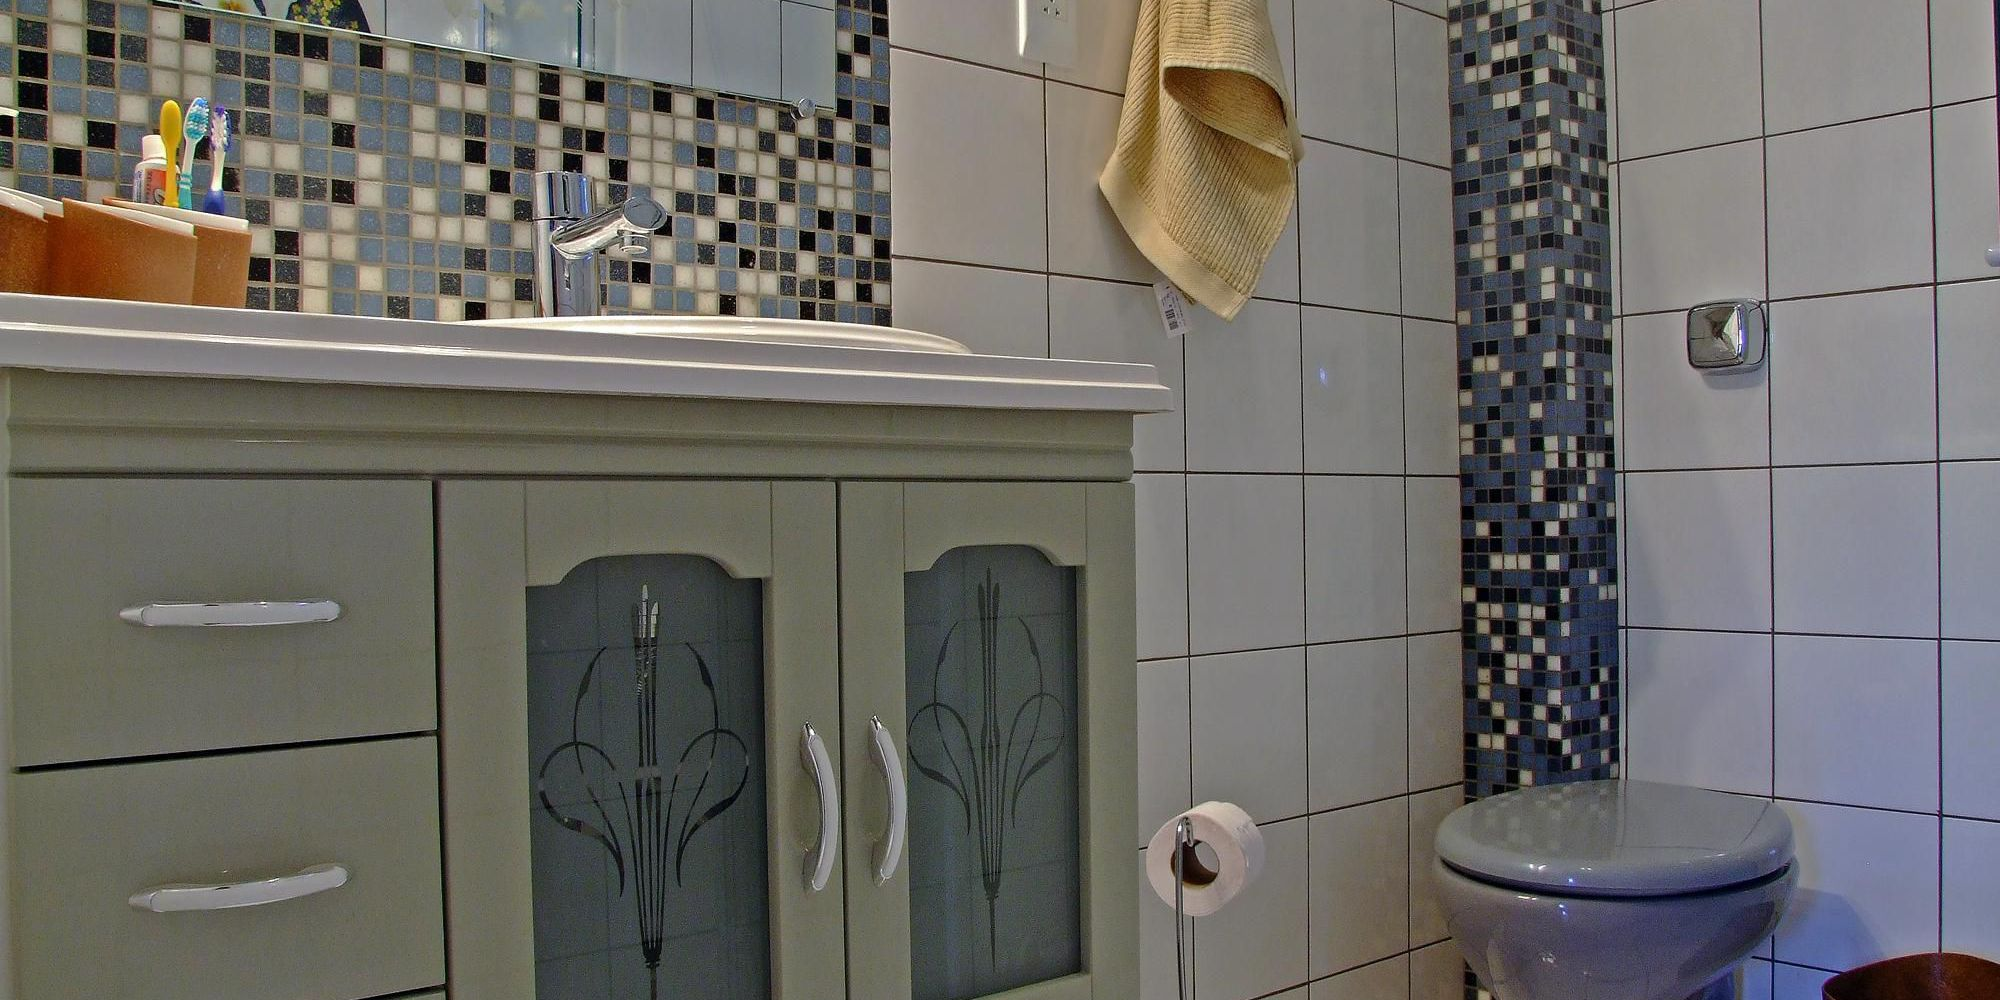 banheiro banheiro tucuruvi natalia ribas viva decora.jpg #654930 2000 1000